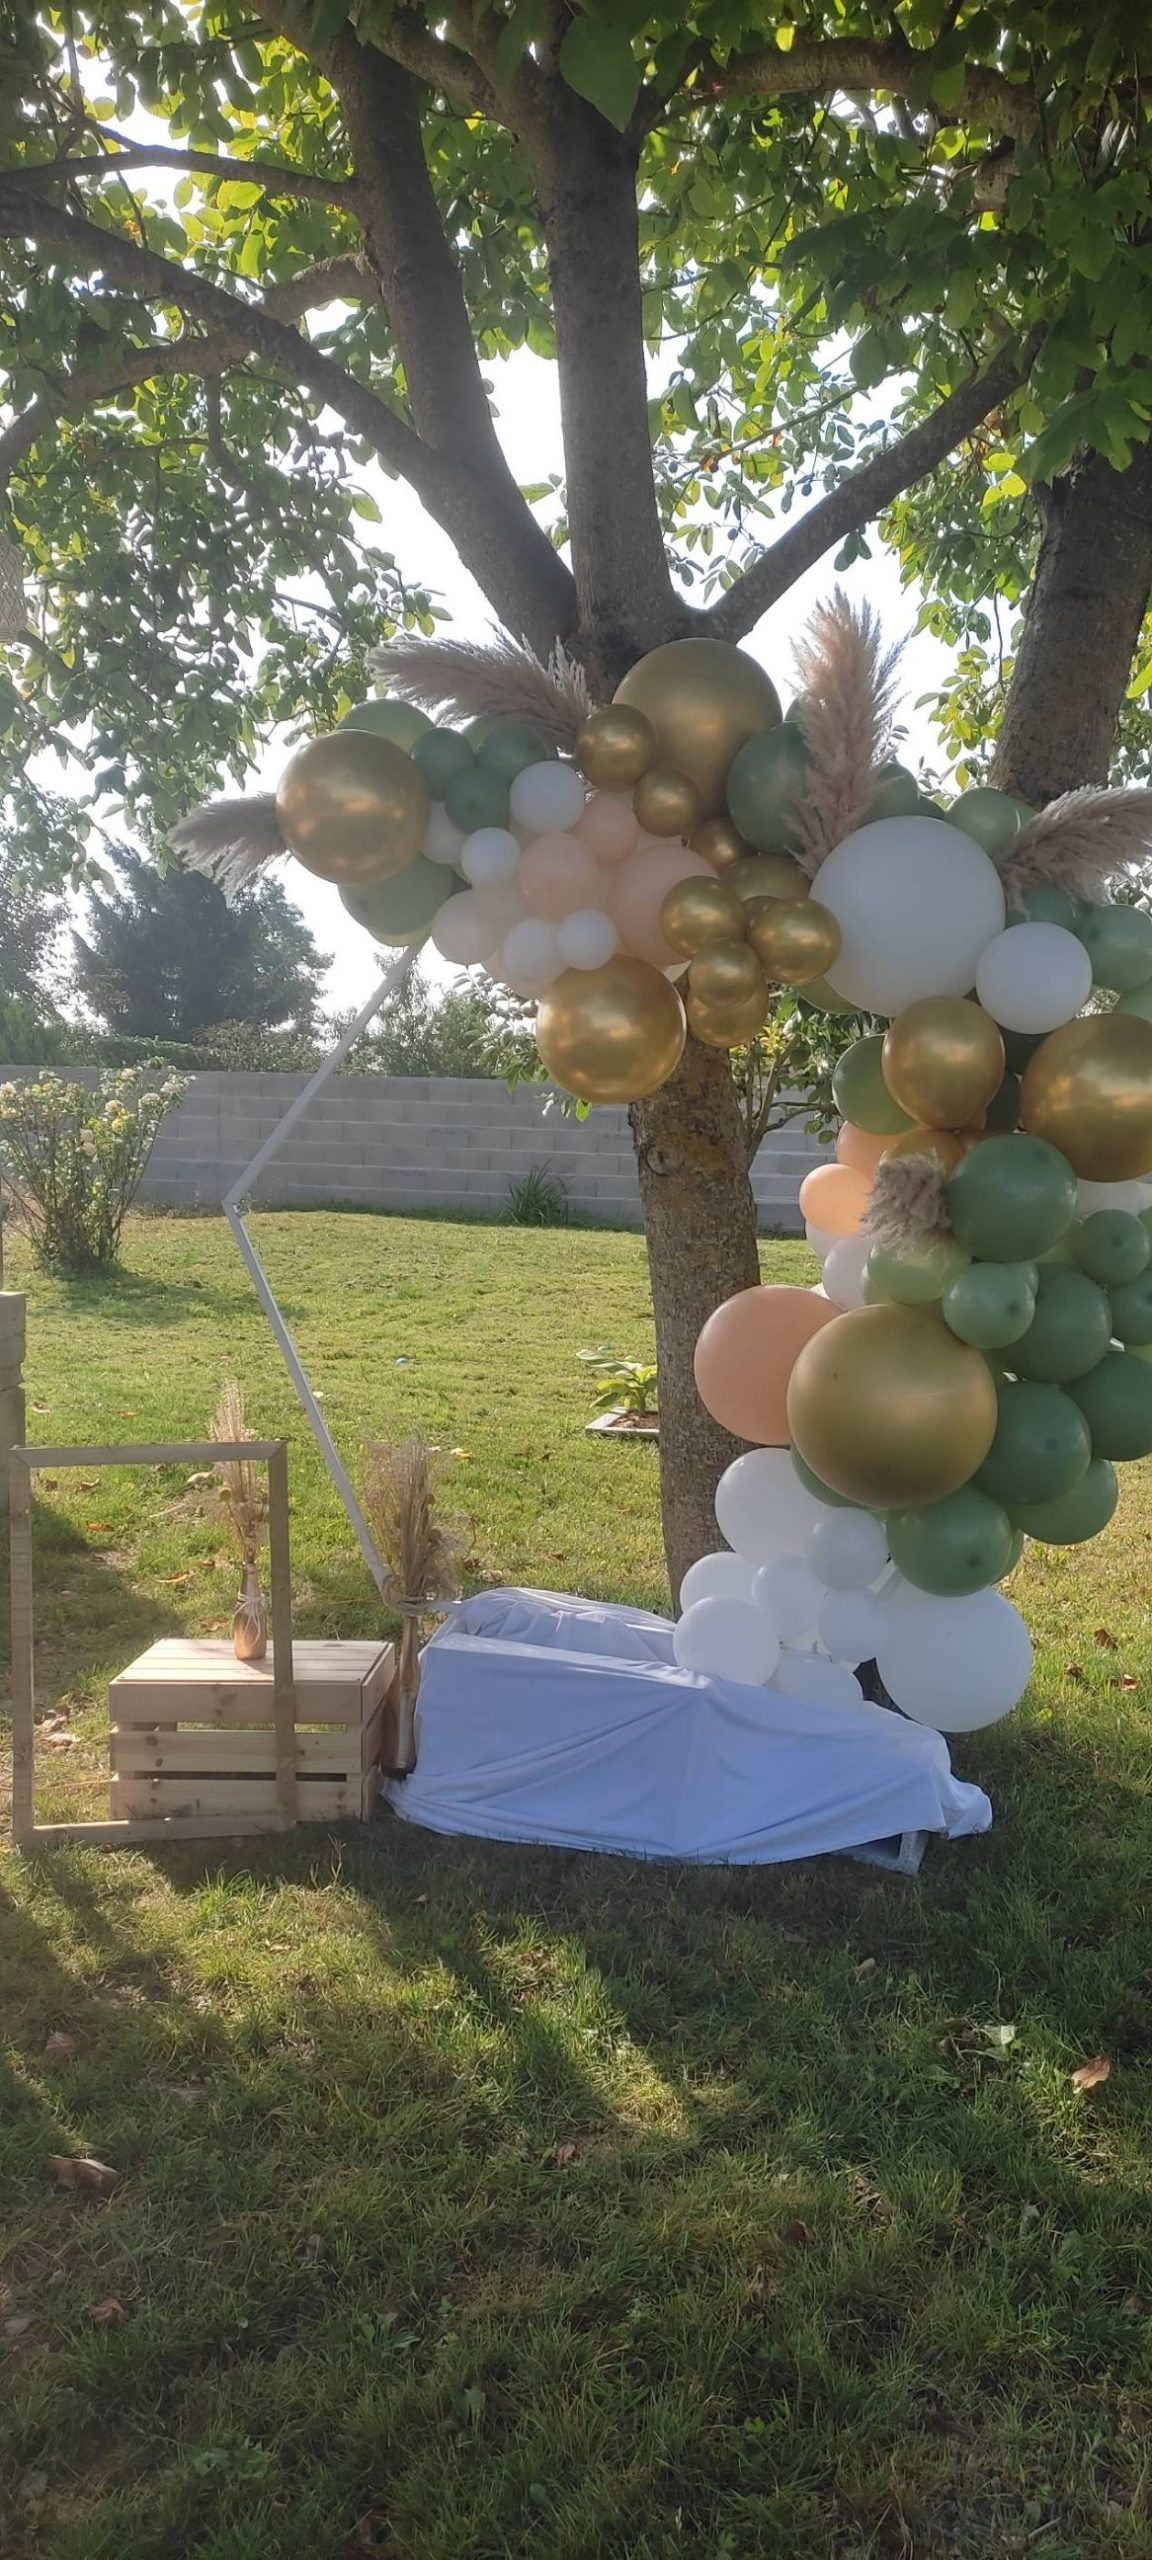 pacs anais camille - les moments m wedding planner lyon